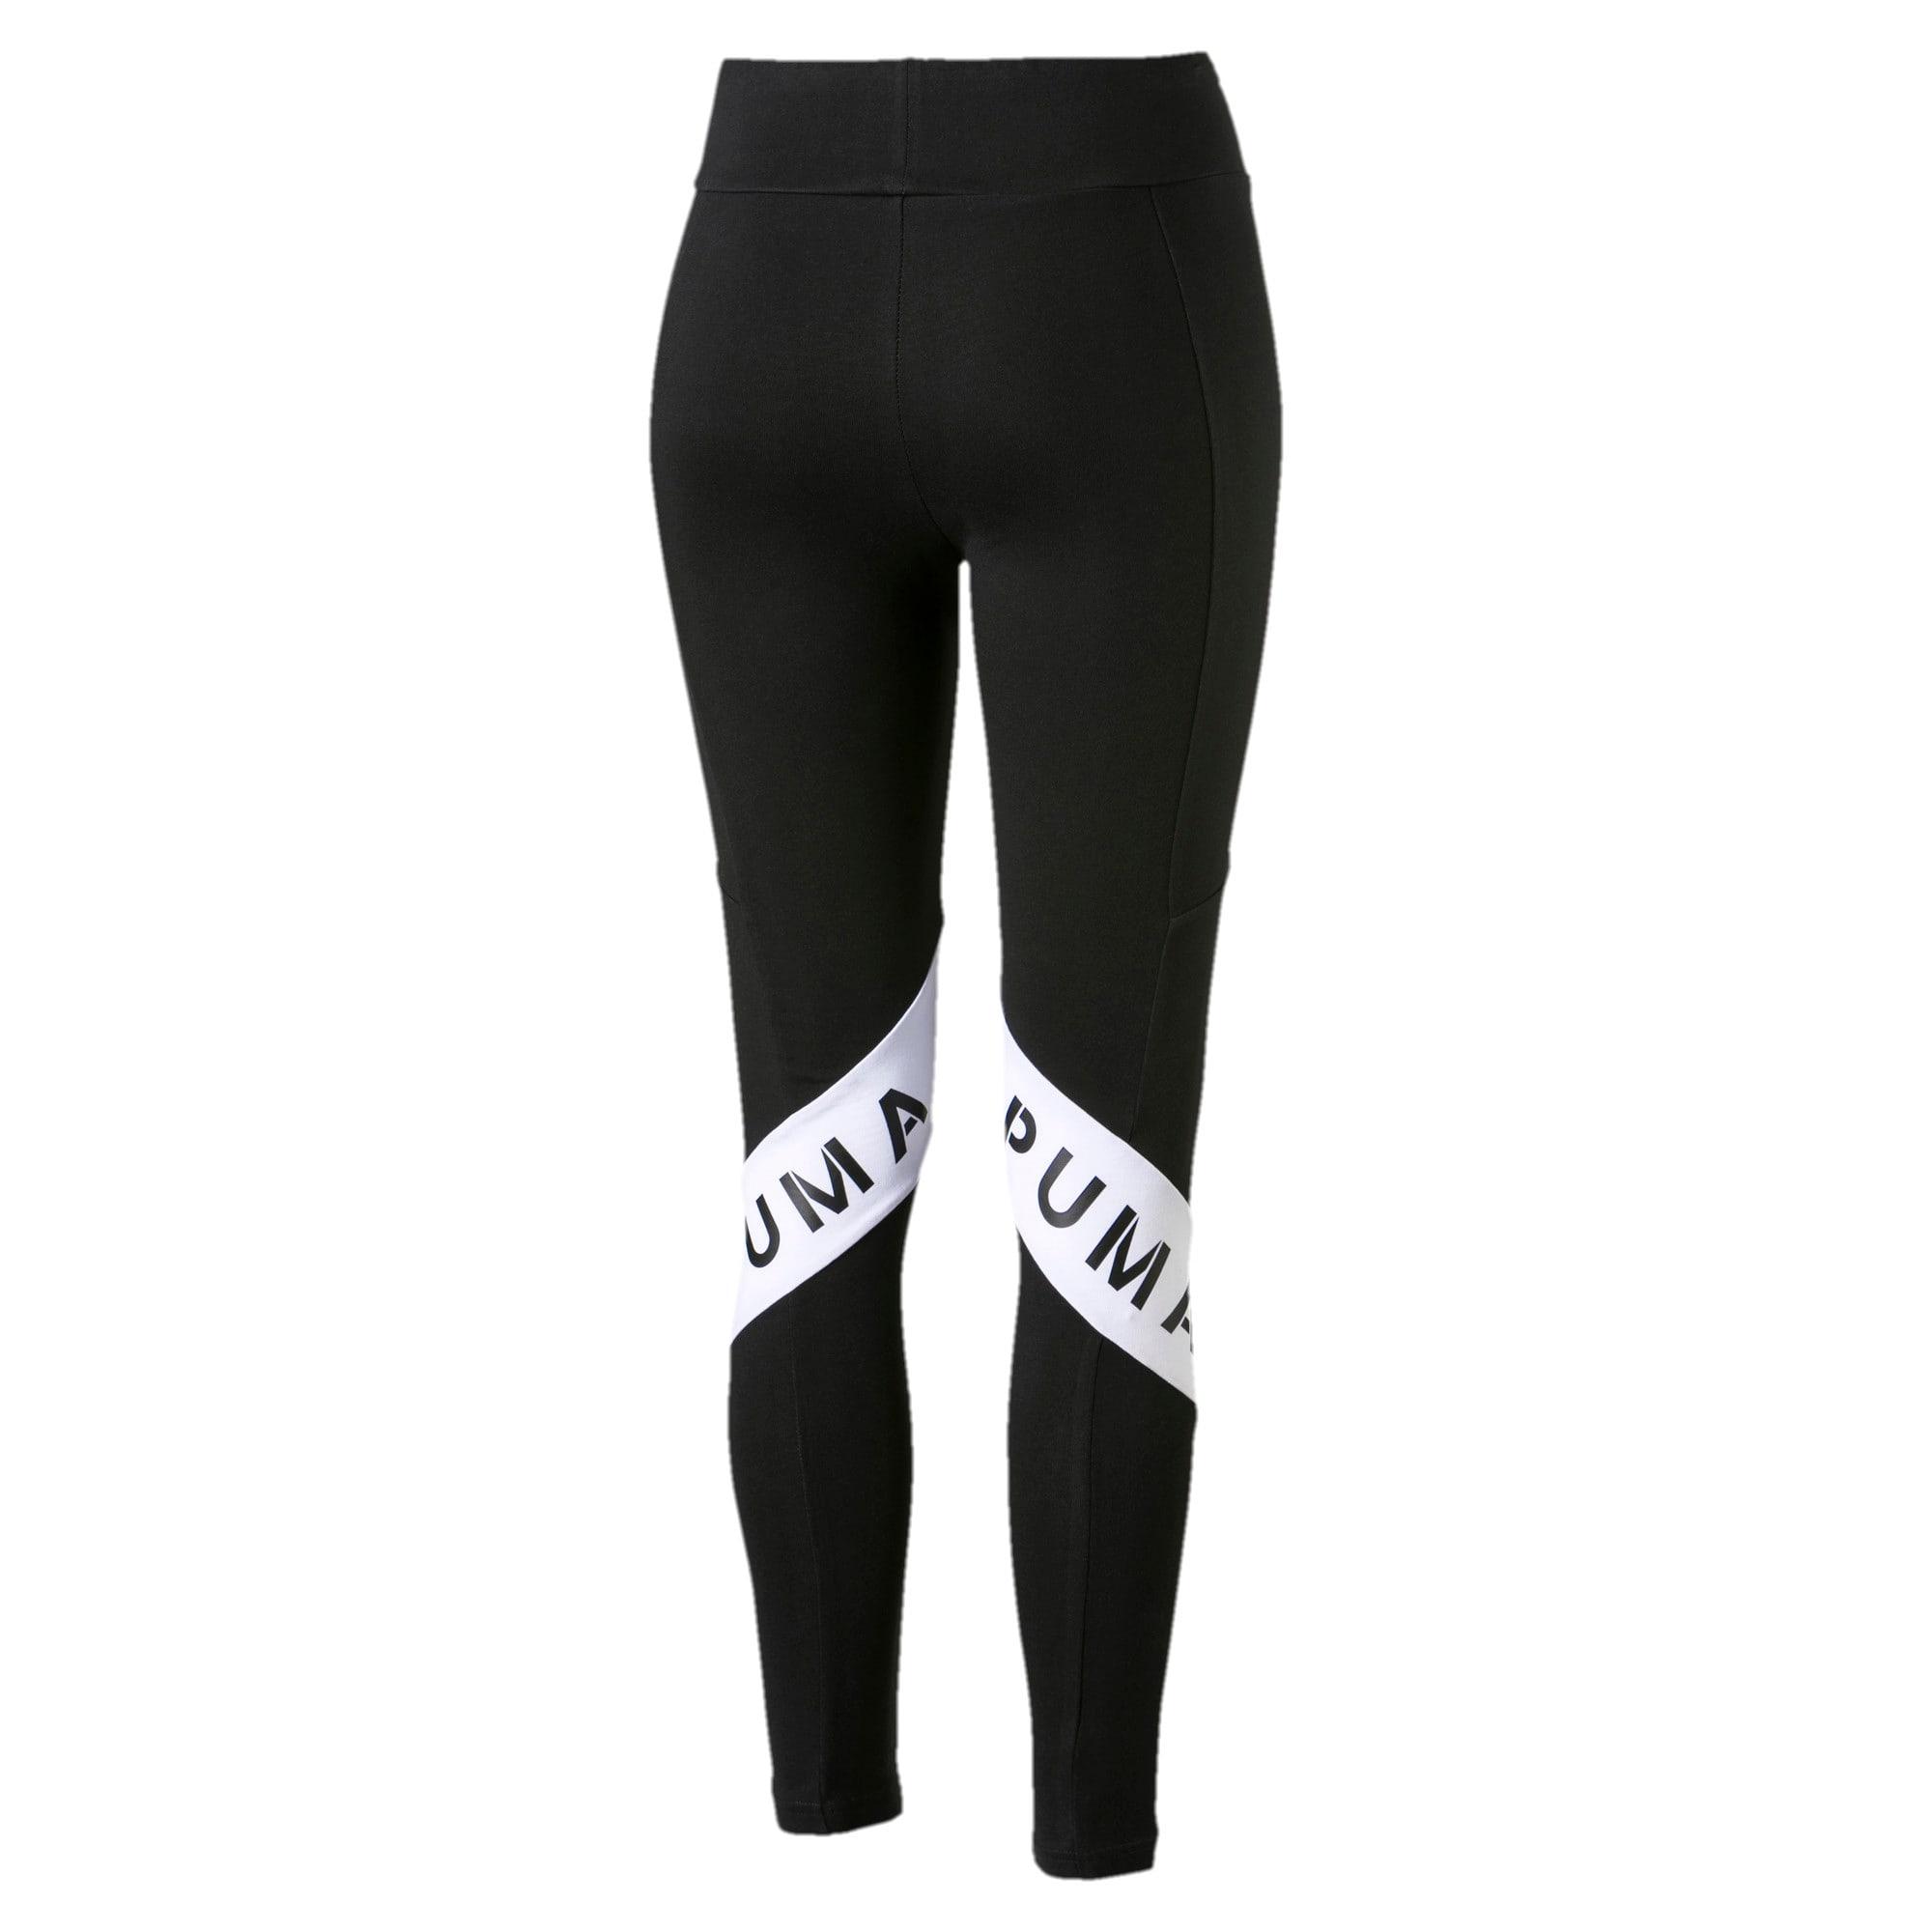 Thumbnail 2 of PUMA XTG Women's Leggings, Cotton Black, medium